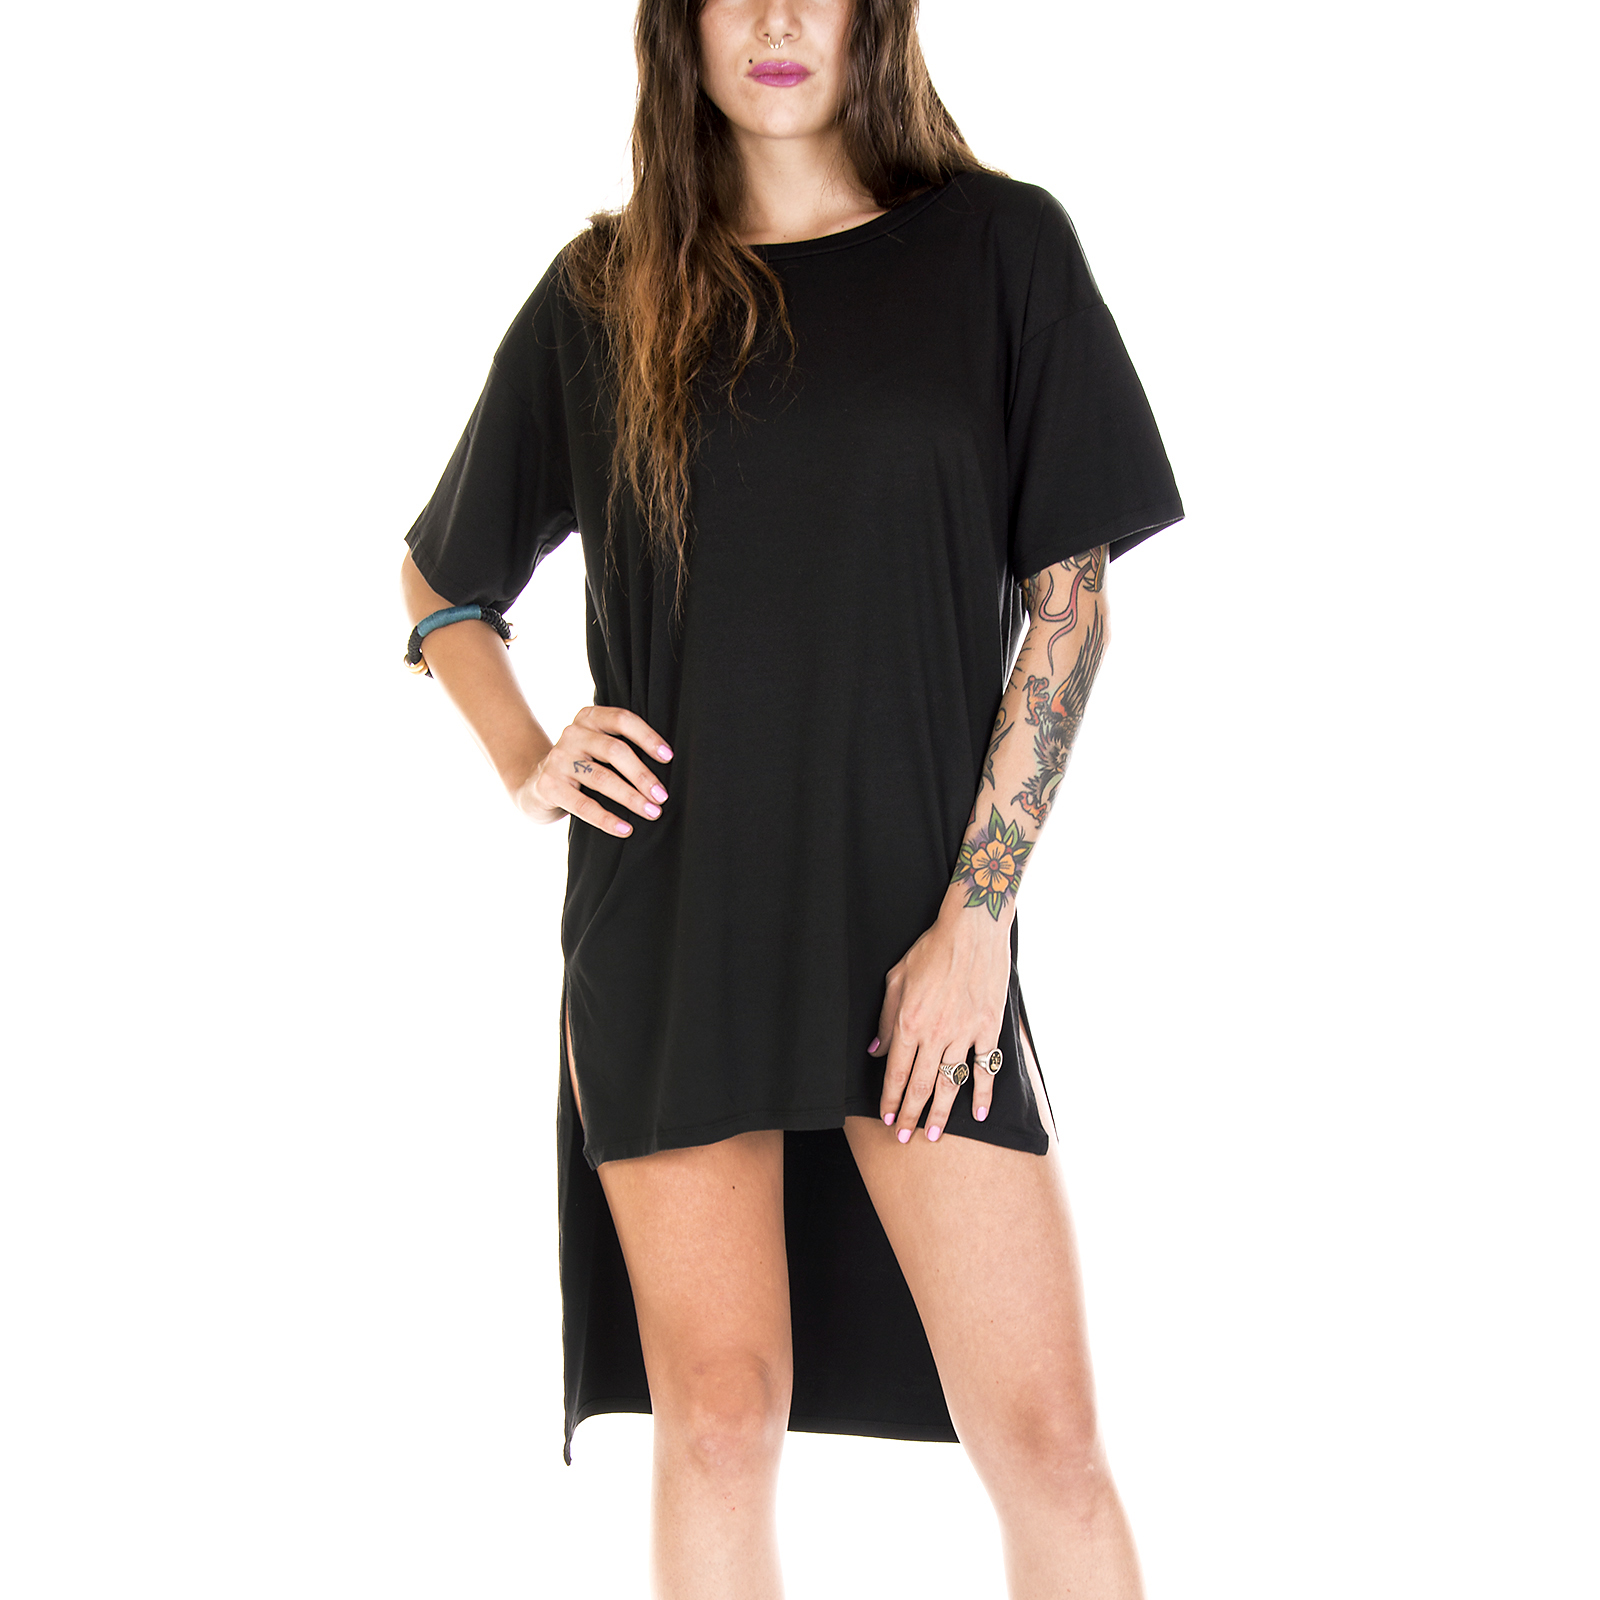 Groceries Kleidung   Kleid Frau Epf-L65 Elaine Tunika-schwarz